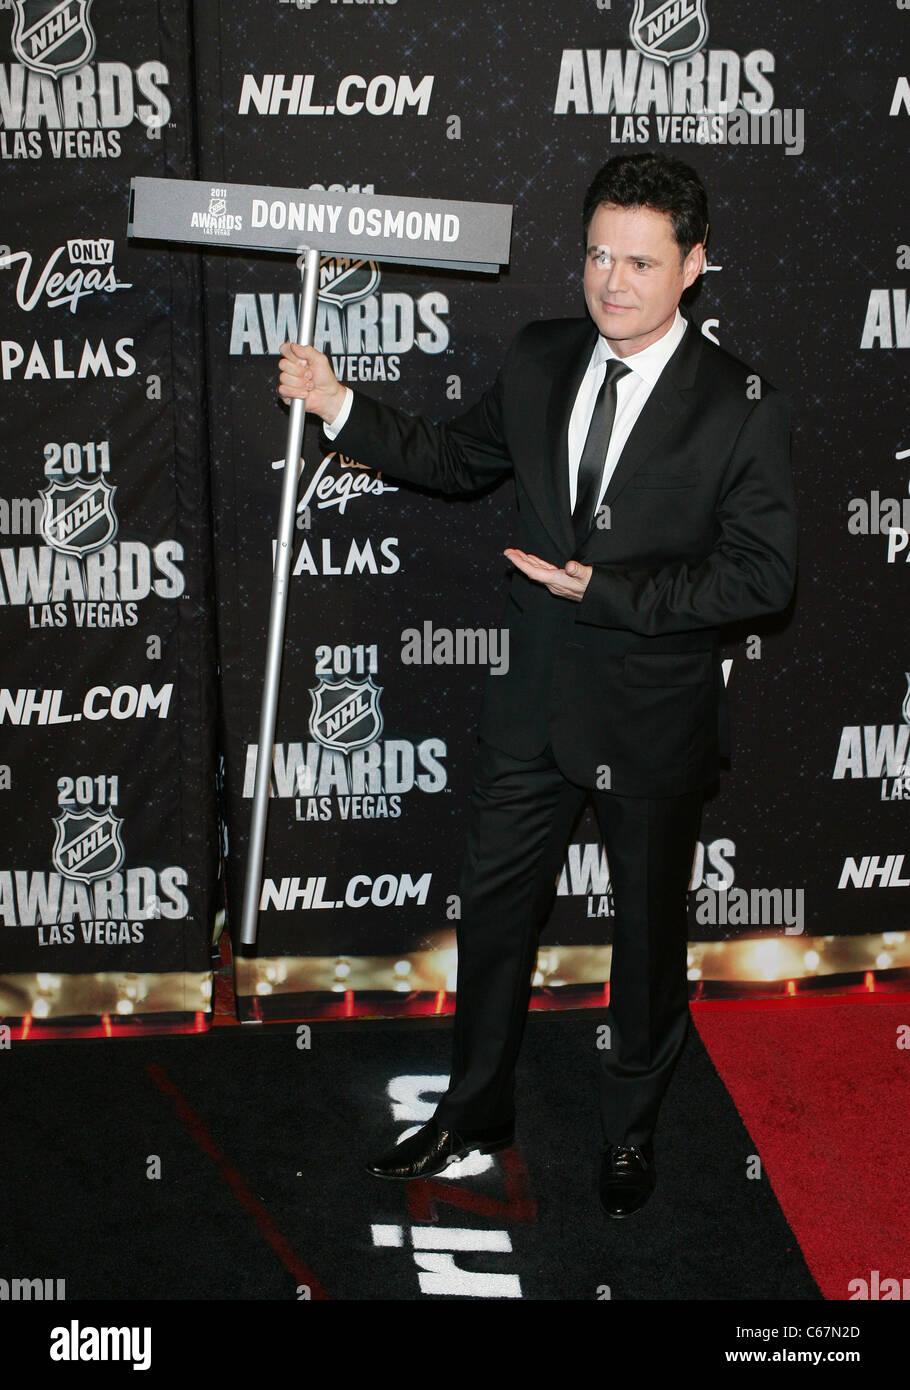 Donny Osmond At Arrivals For 2011 National Hockey League Nhl Awards